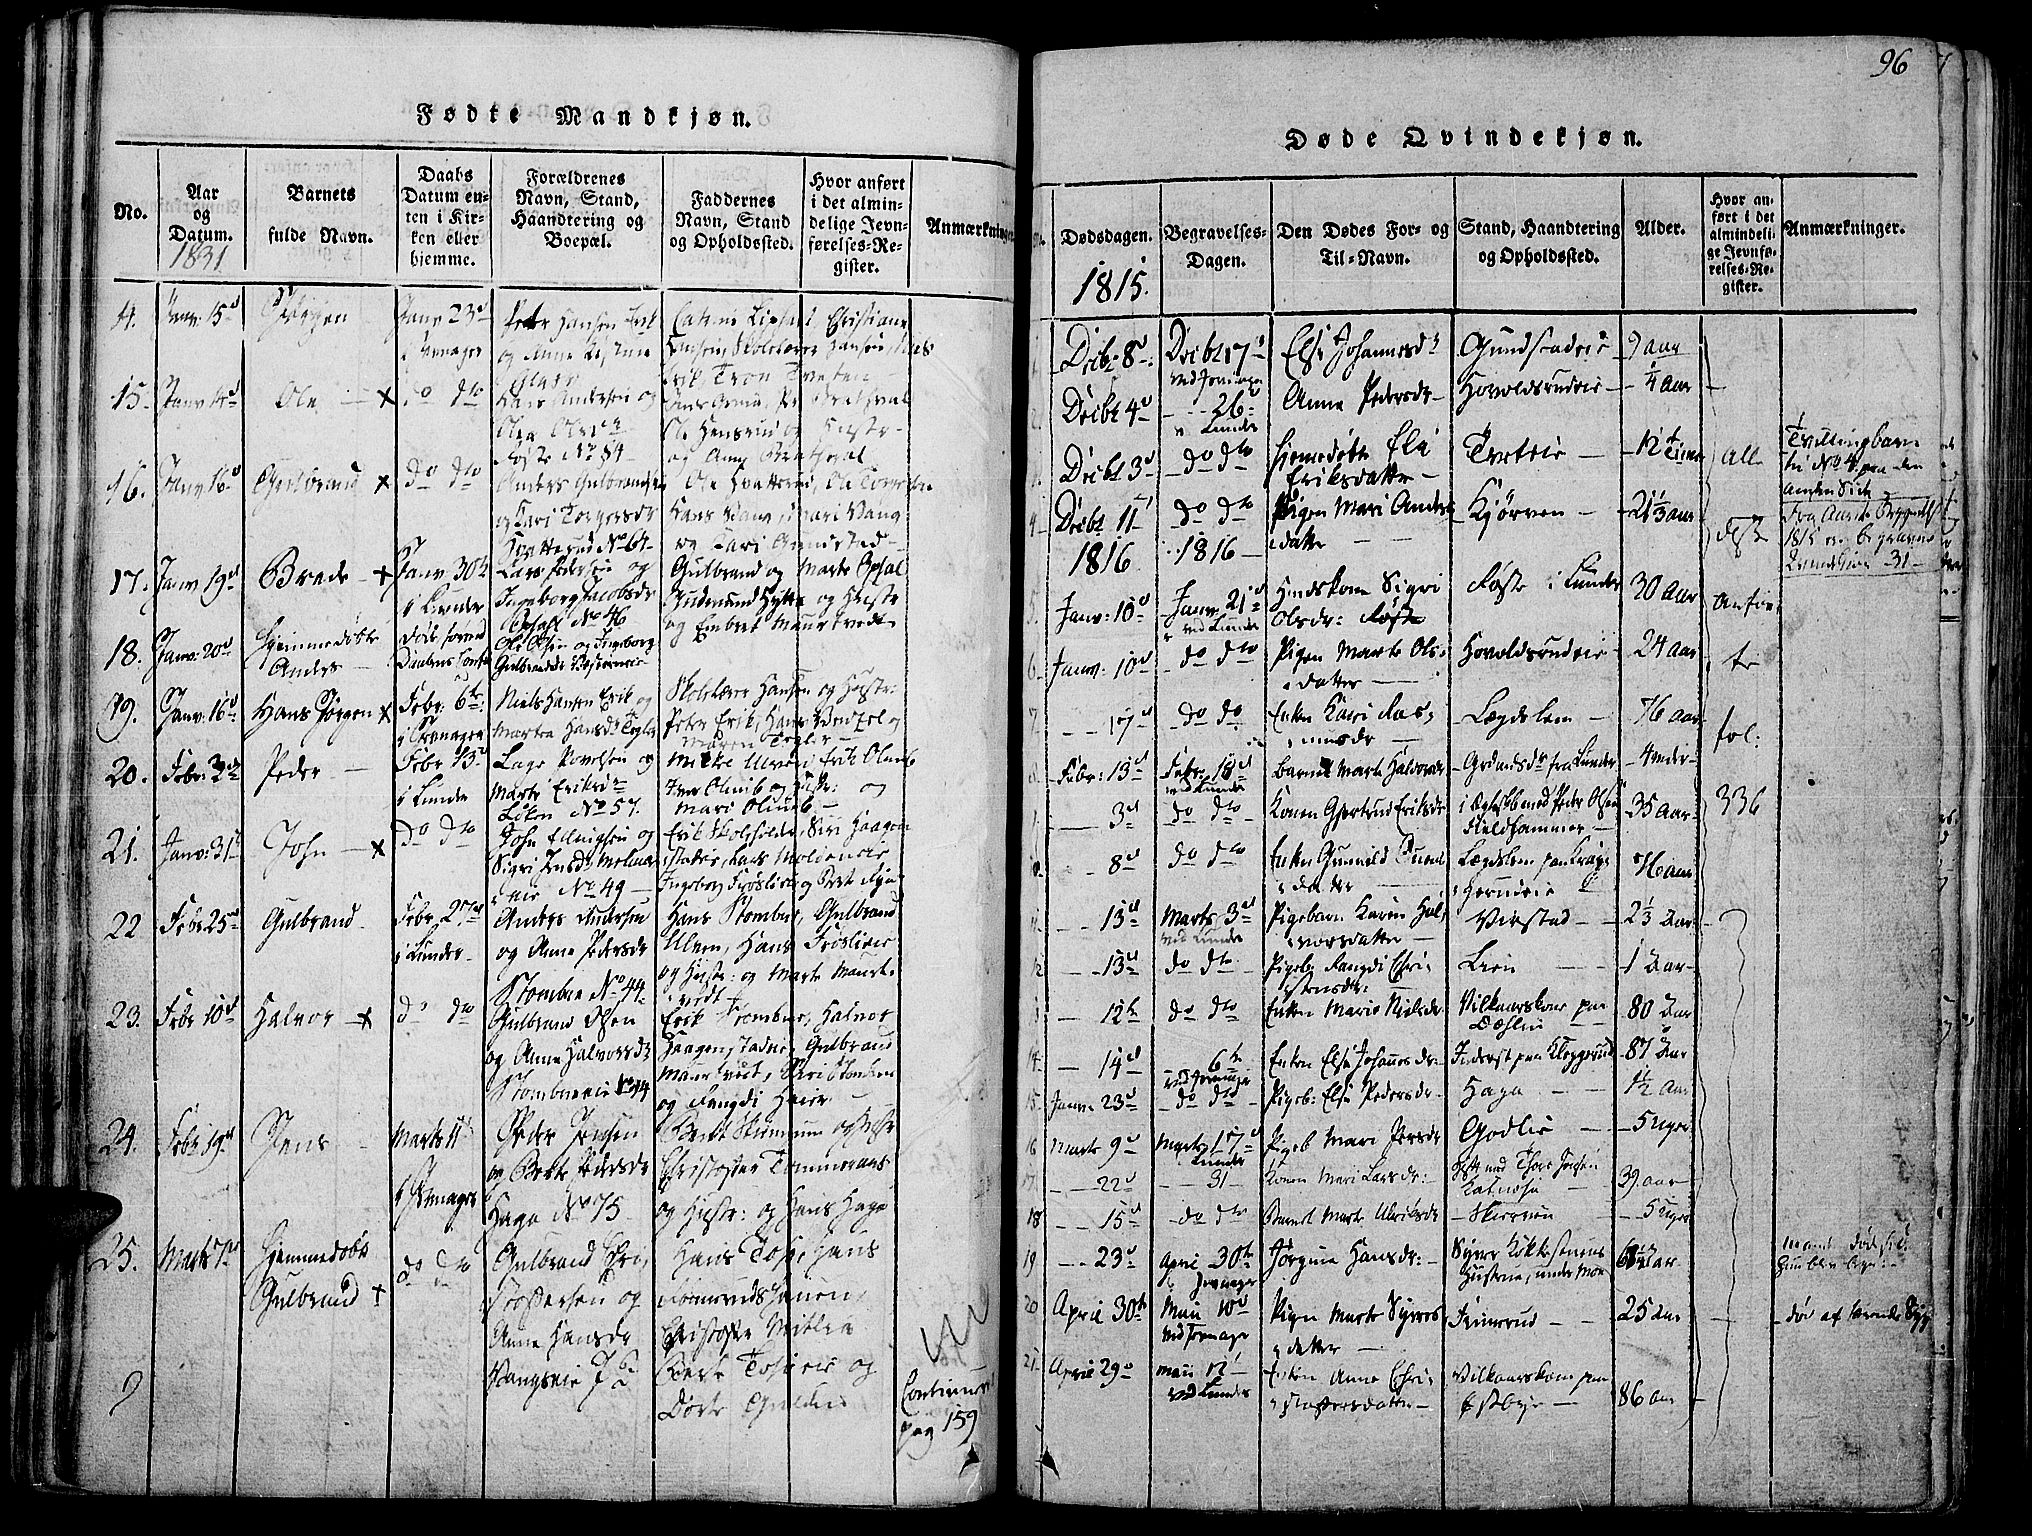 SAH, Jevnaker prestekontor, Ministerialbok nr. 5, 1815-1837, s. 96